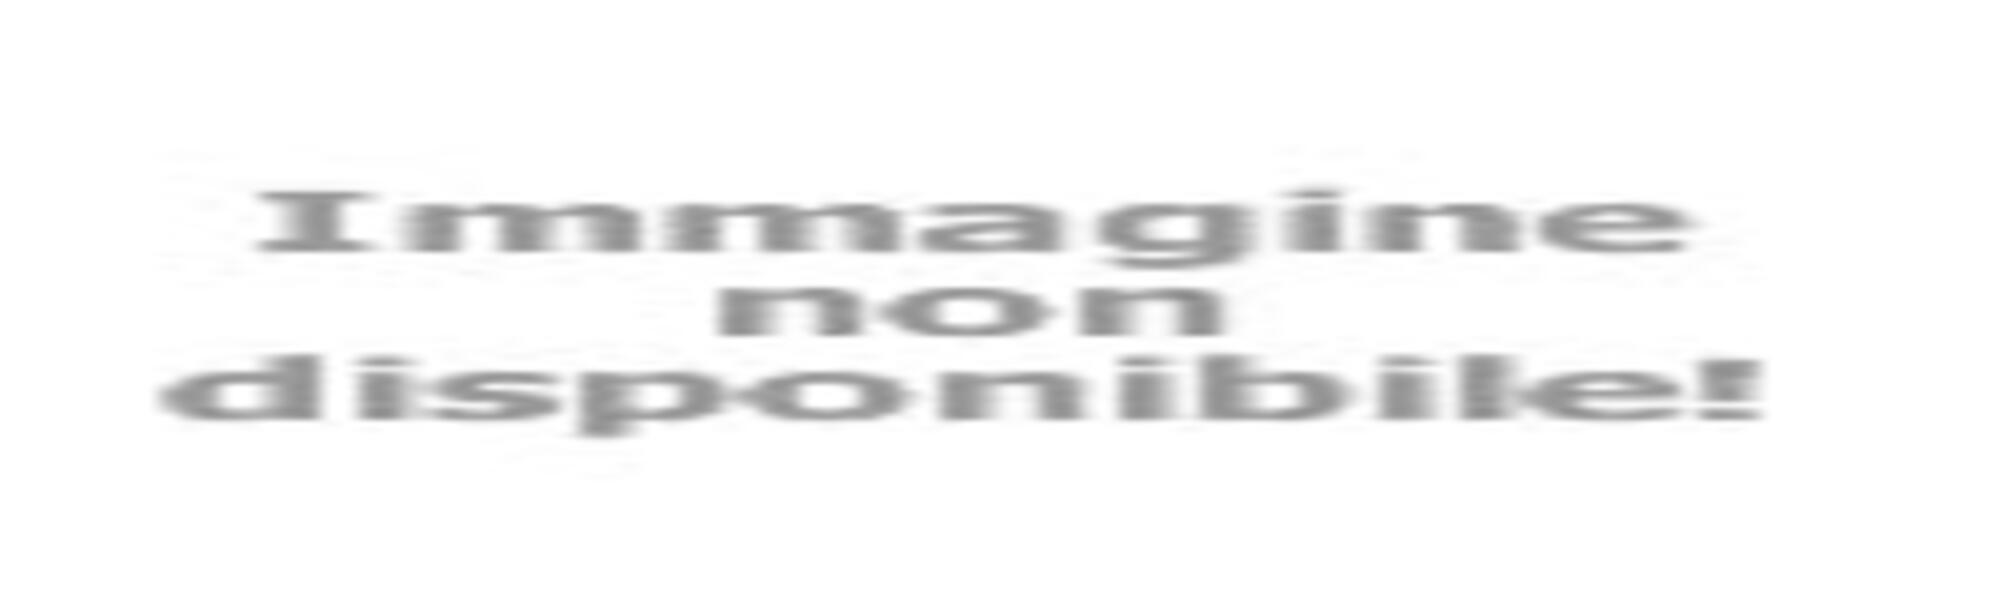 Offerta Frank Merenda Marketing Evil 16-17 febbraio 2019 Rimini Palacongressi